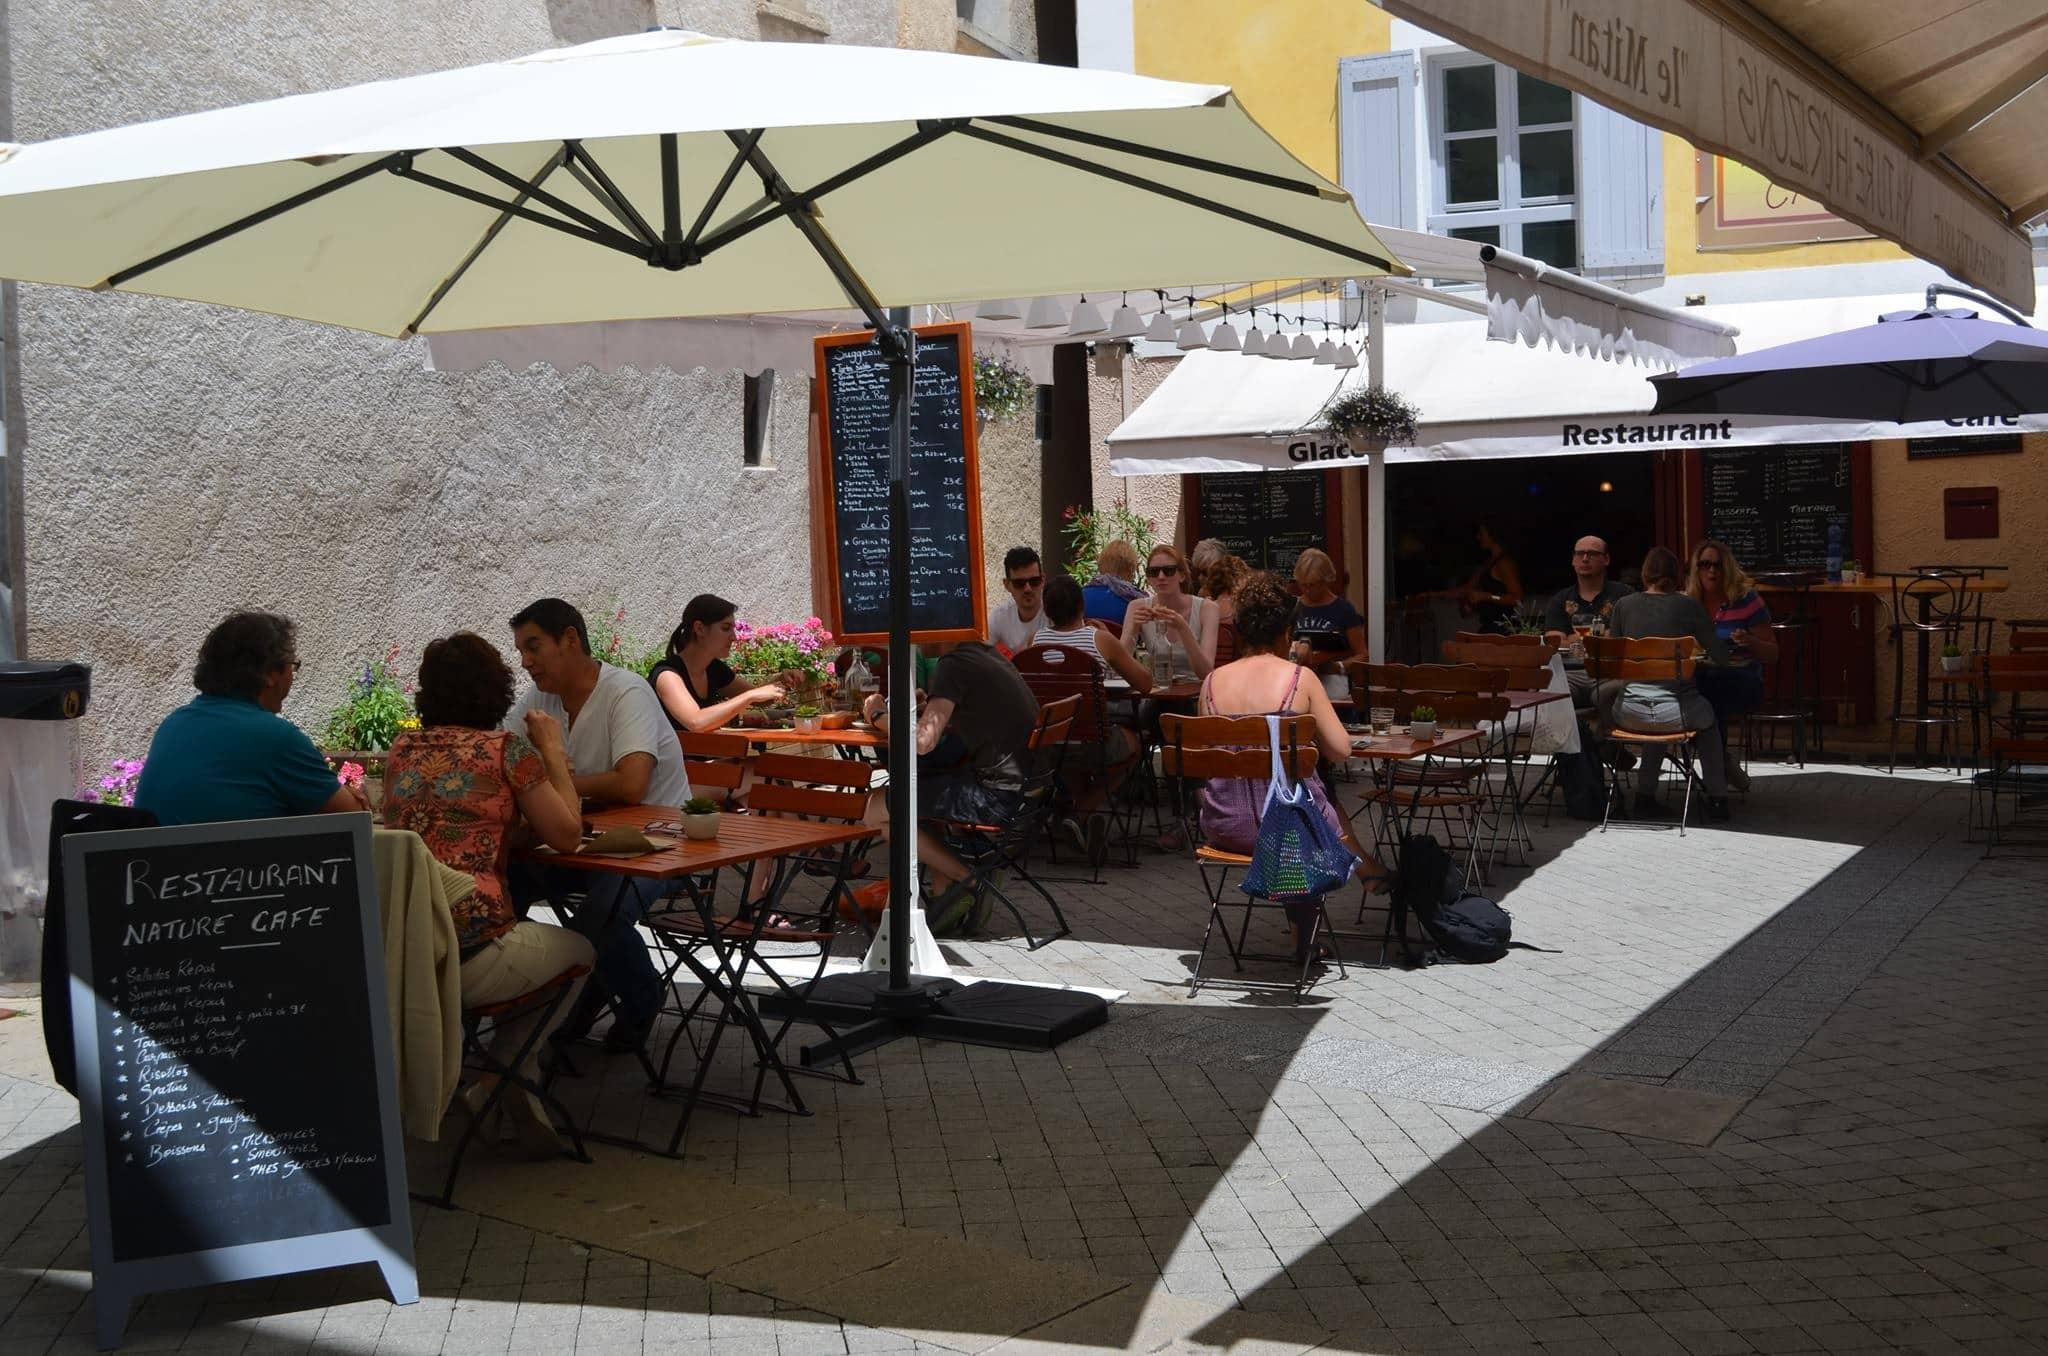 Visiter Castellane : Nature Cafe